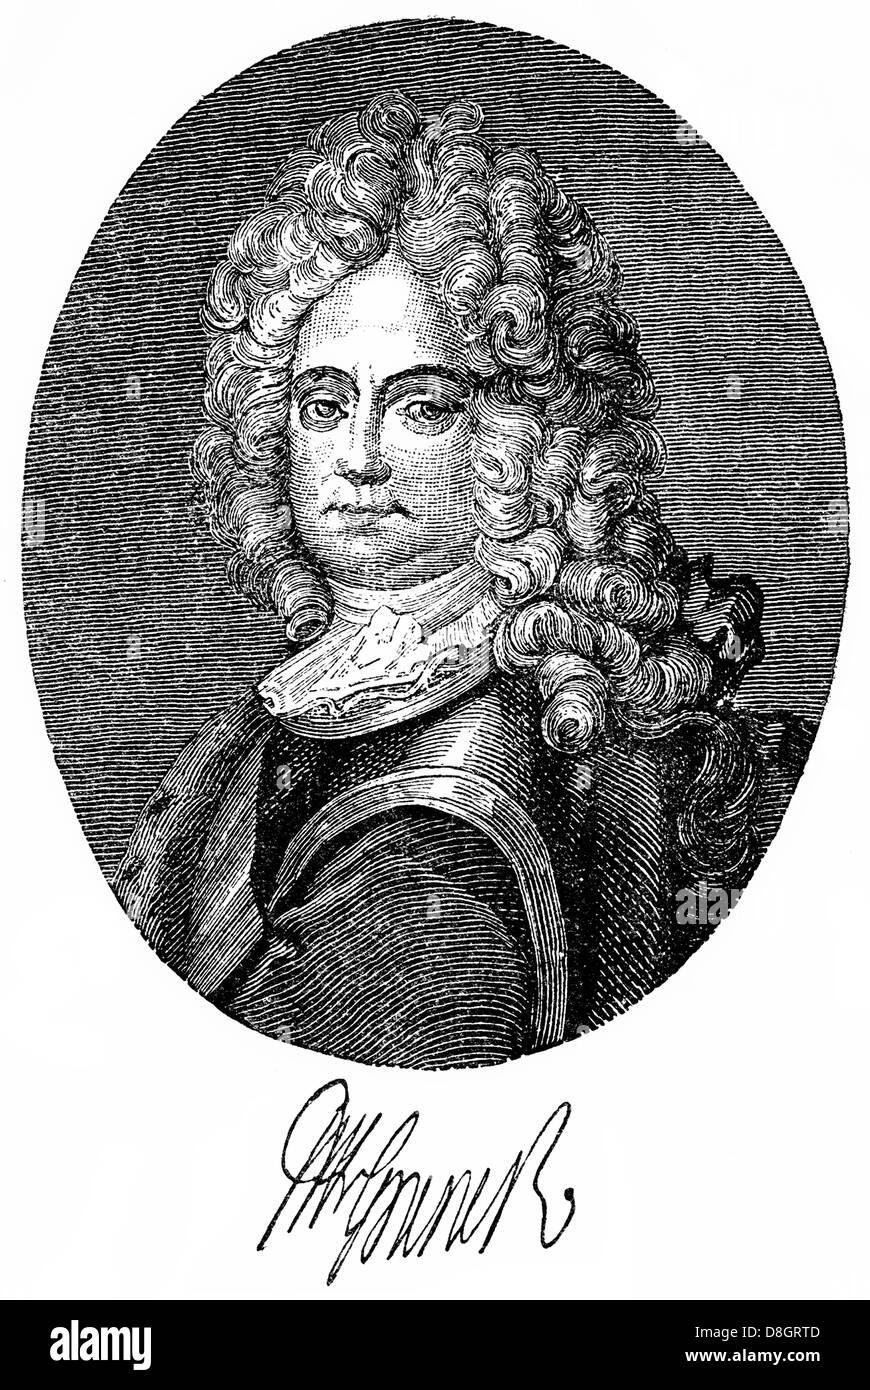 Friedrich Wilhelm von Grumbkow, 1678 - 1739, a Prussian Generalfeldmarschall and statesman, 18th century, Germany, - Stock Image